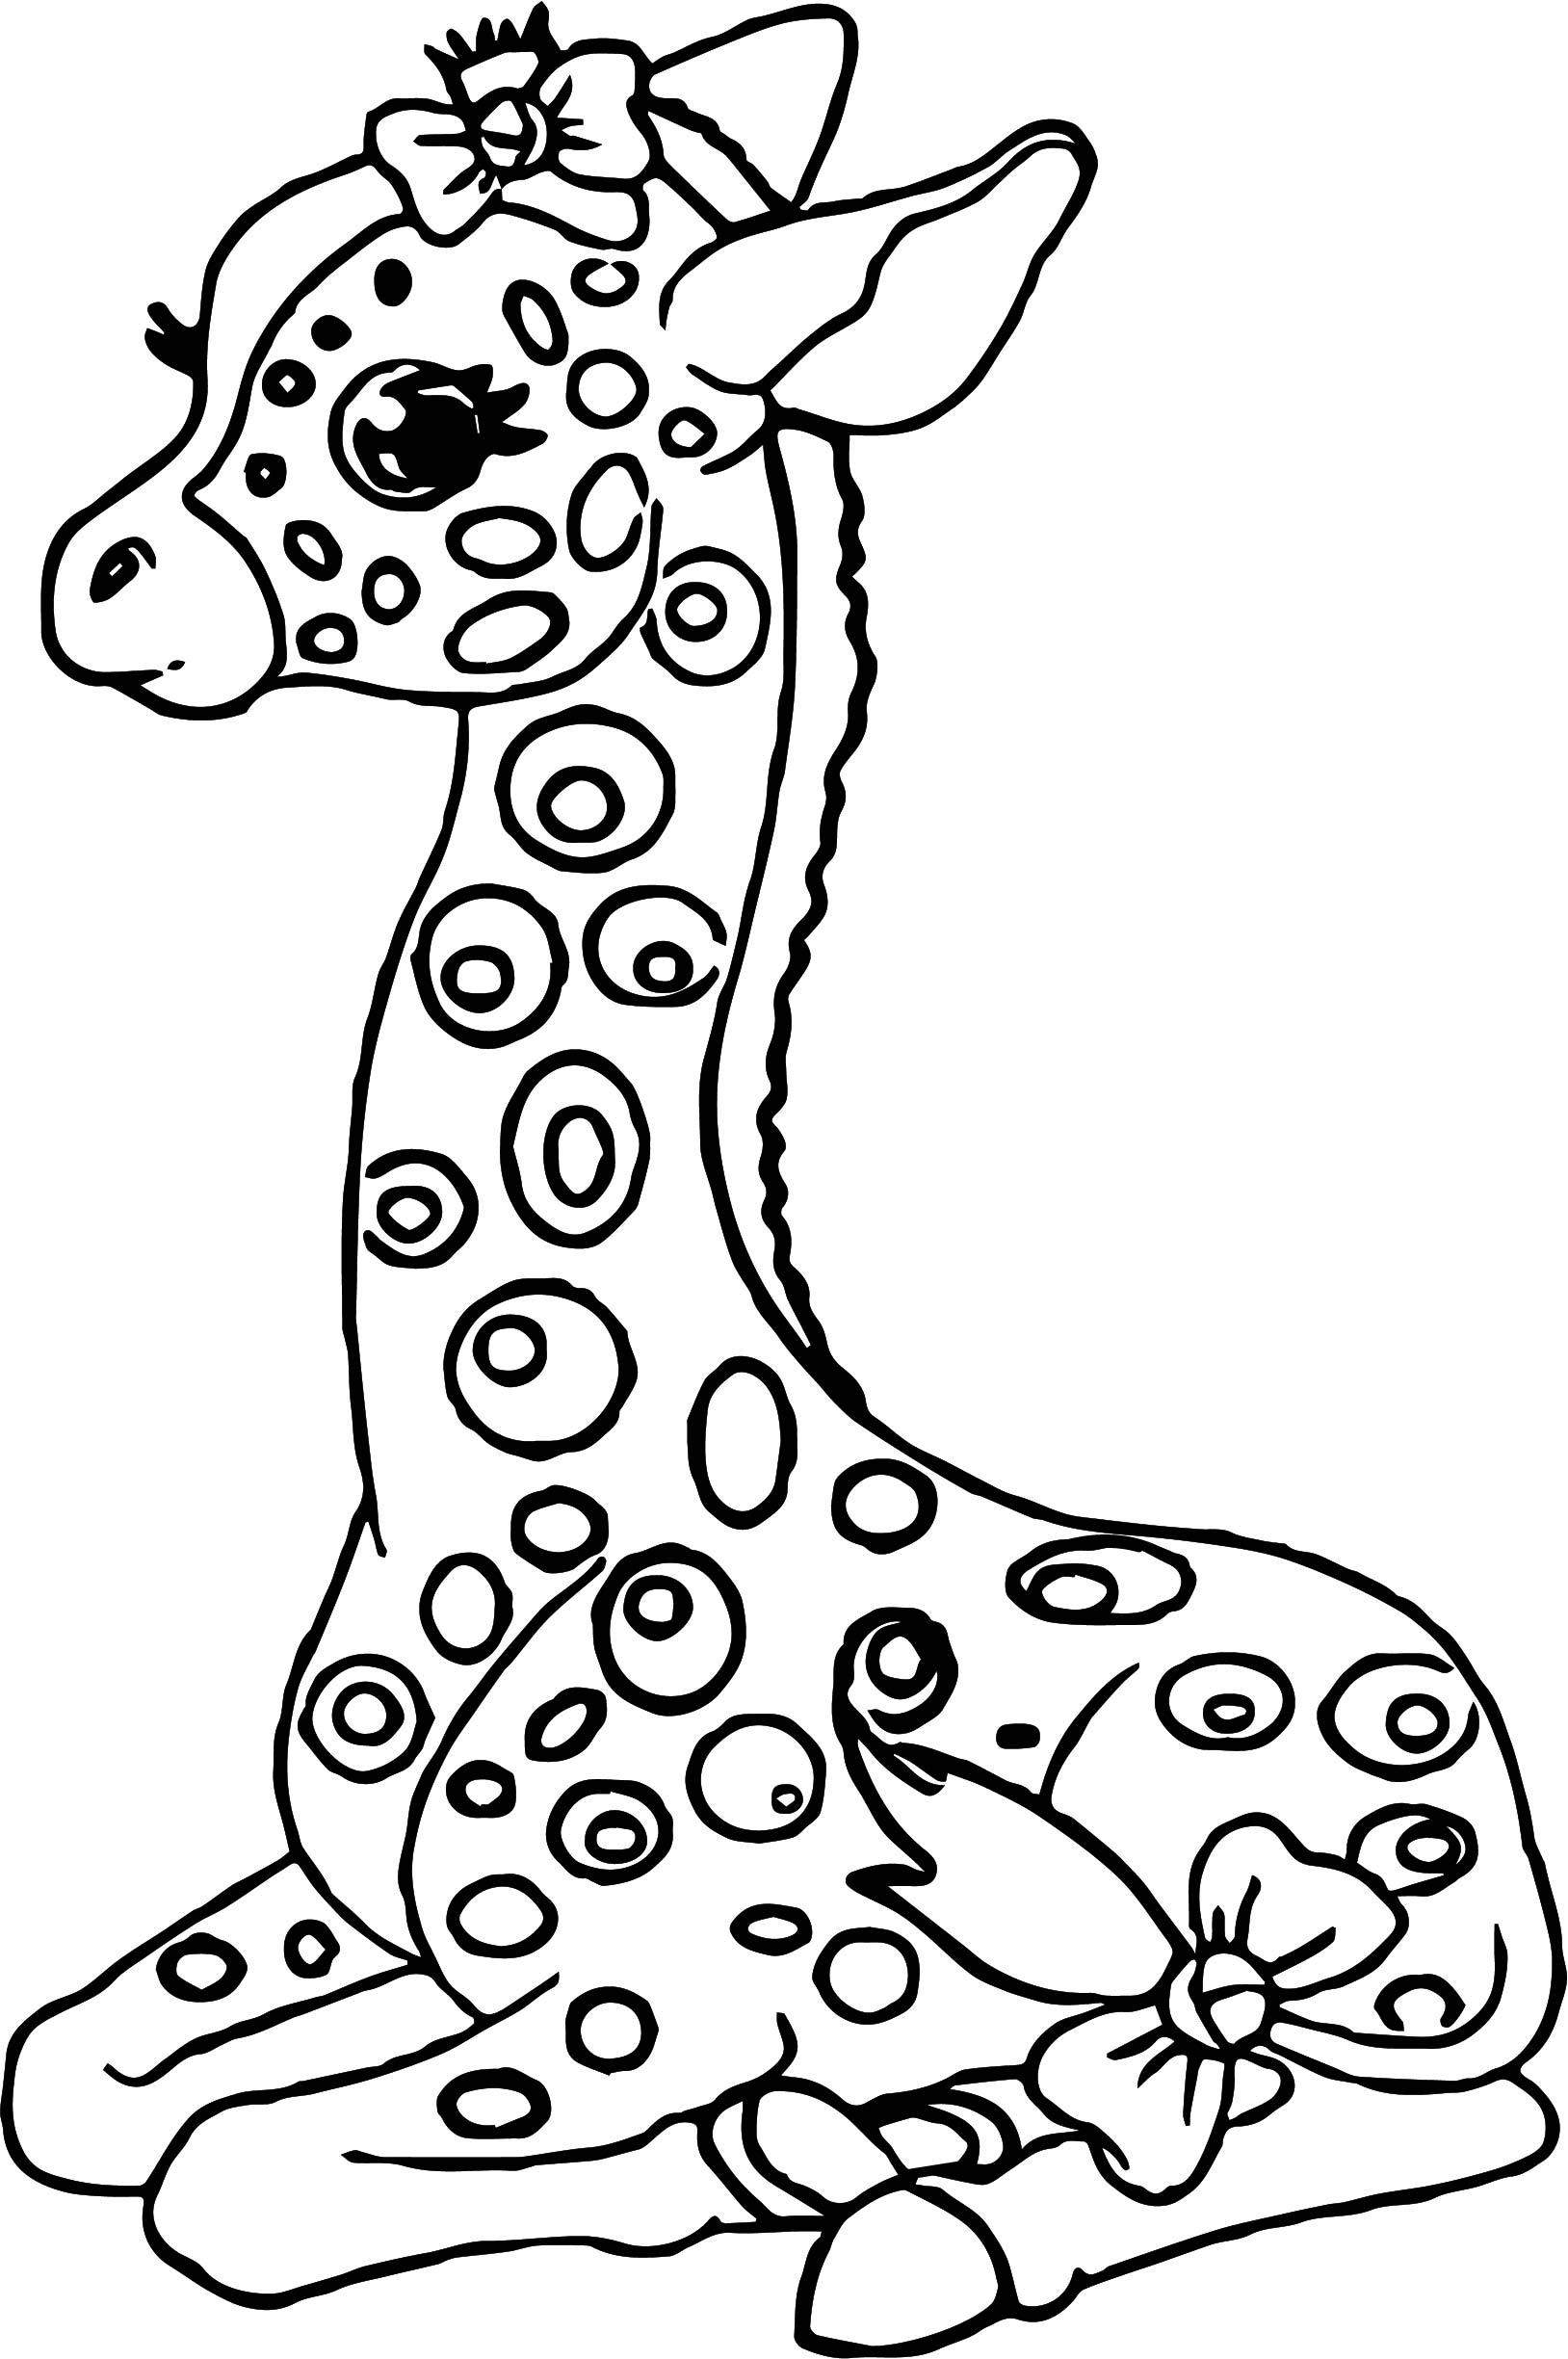 Giraffe Drawing For Kids at GetDrawings | Free download